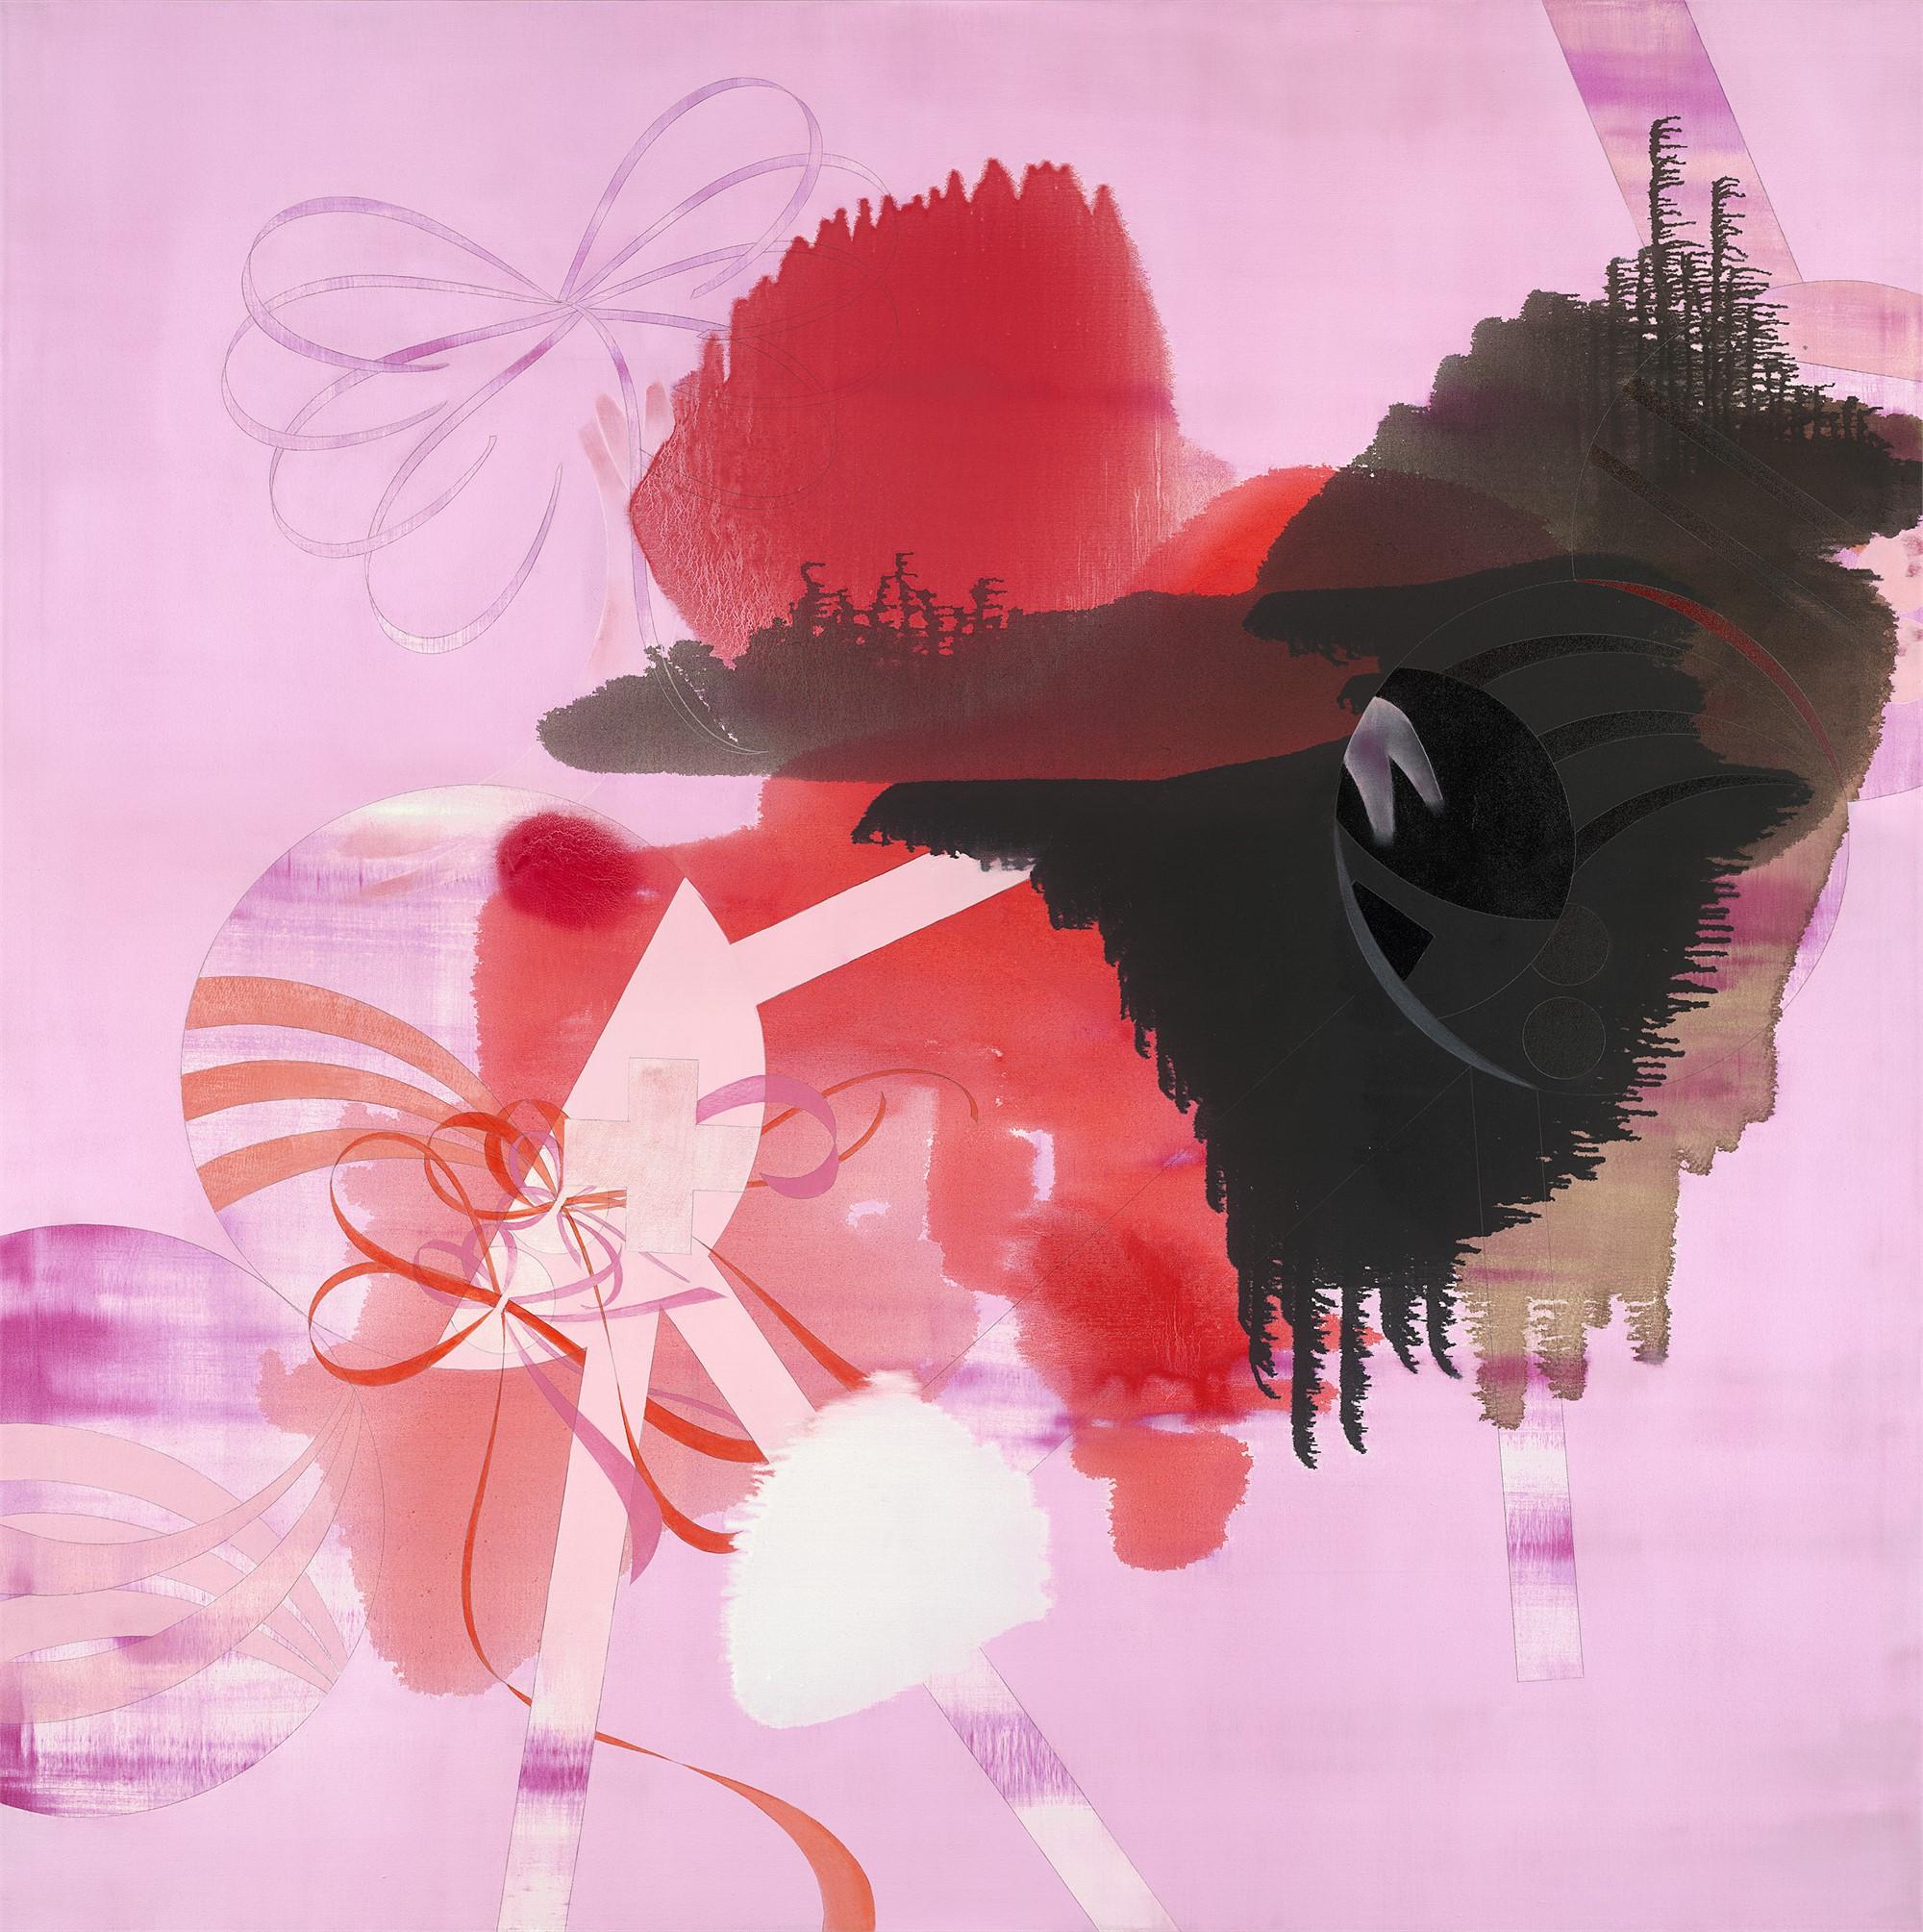 Hydrogen by Kuzana Ogg